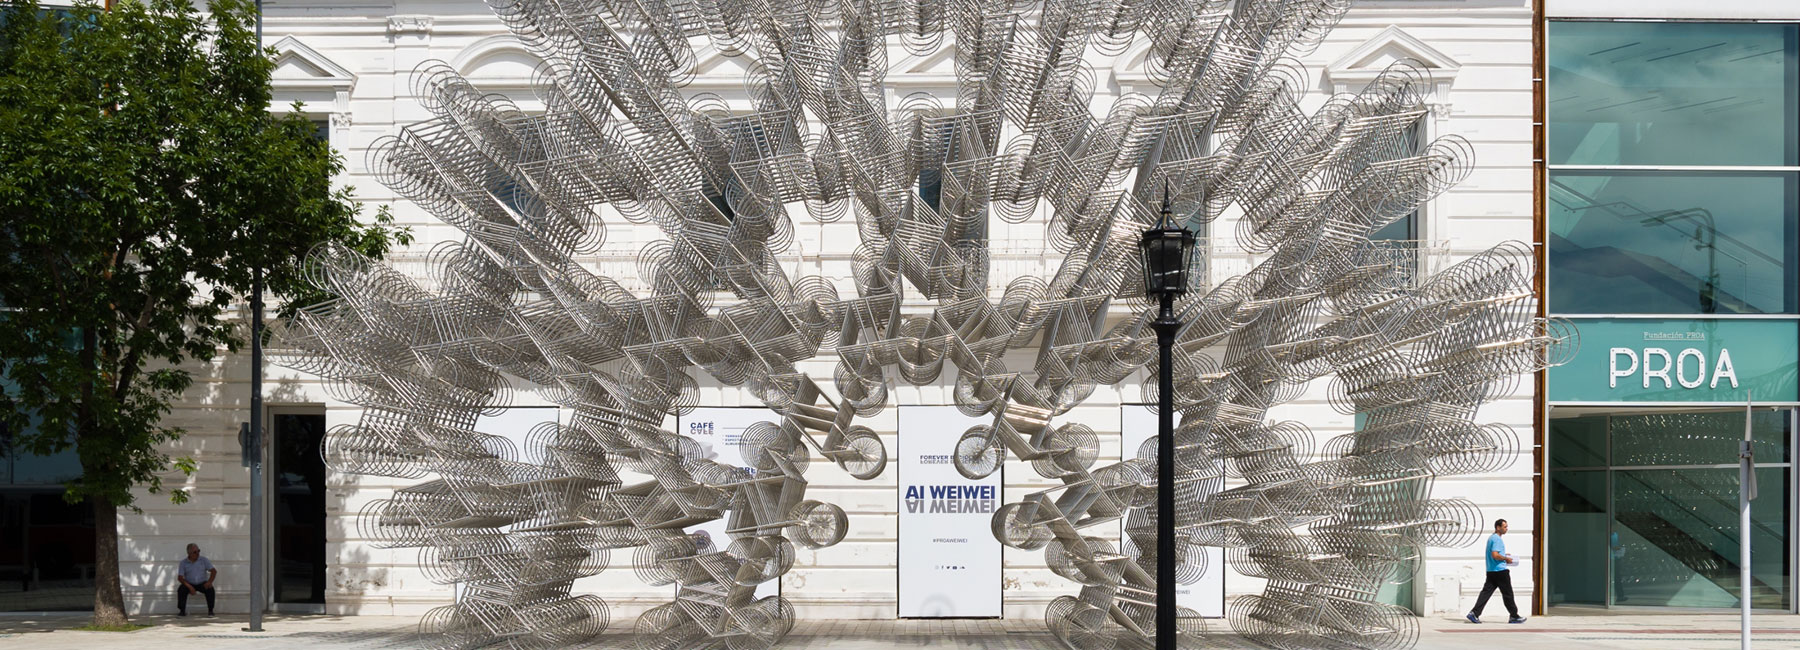 ai-weiwei-inoculation-exhibition-proa-argentina- FAD Magazine